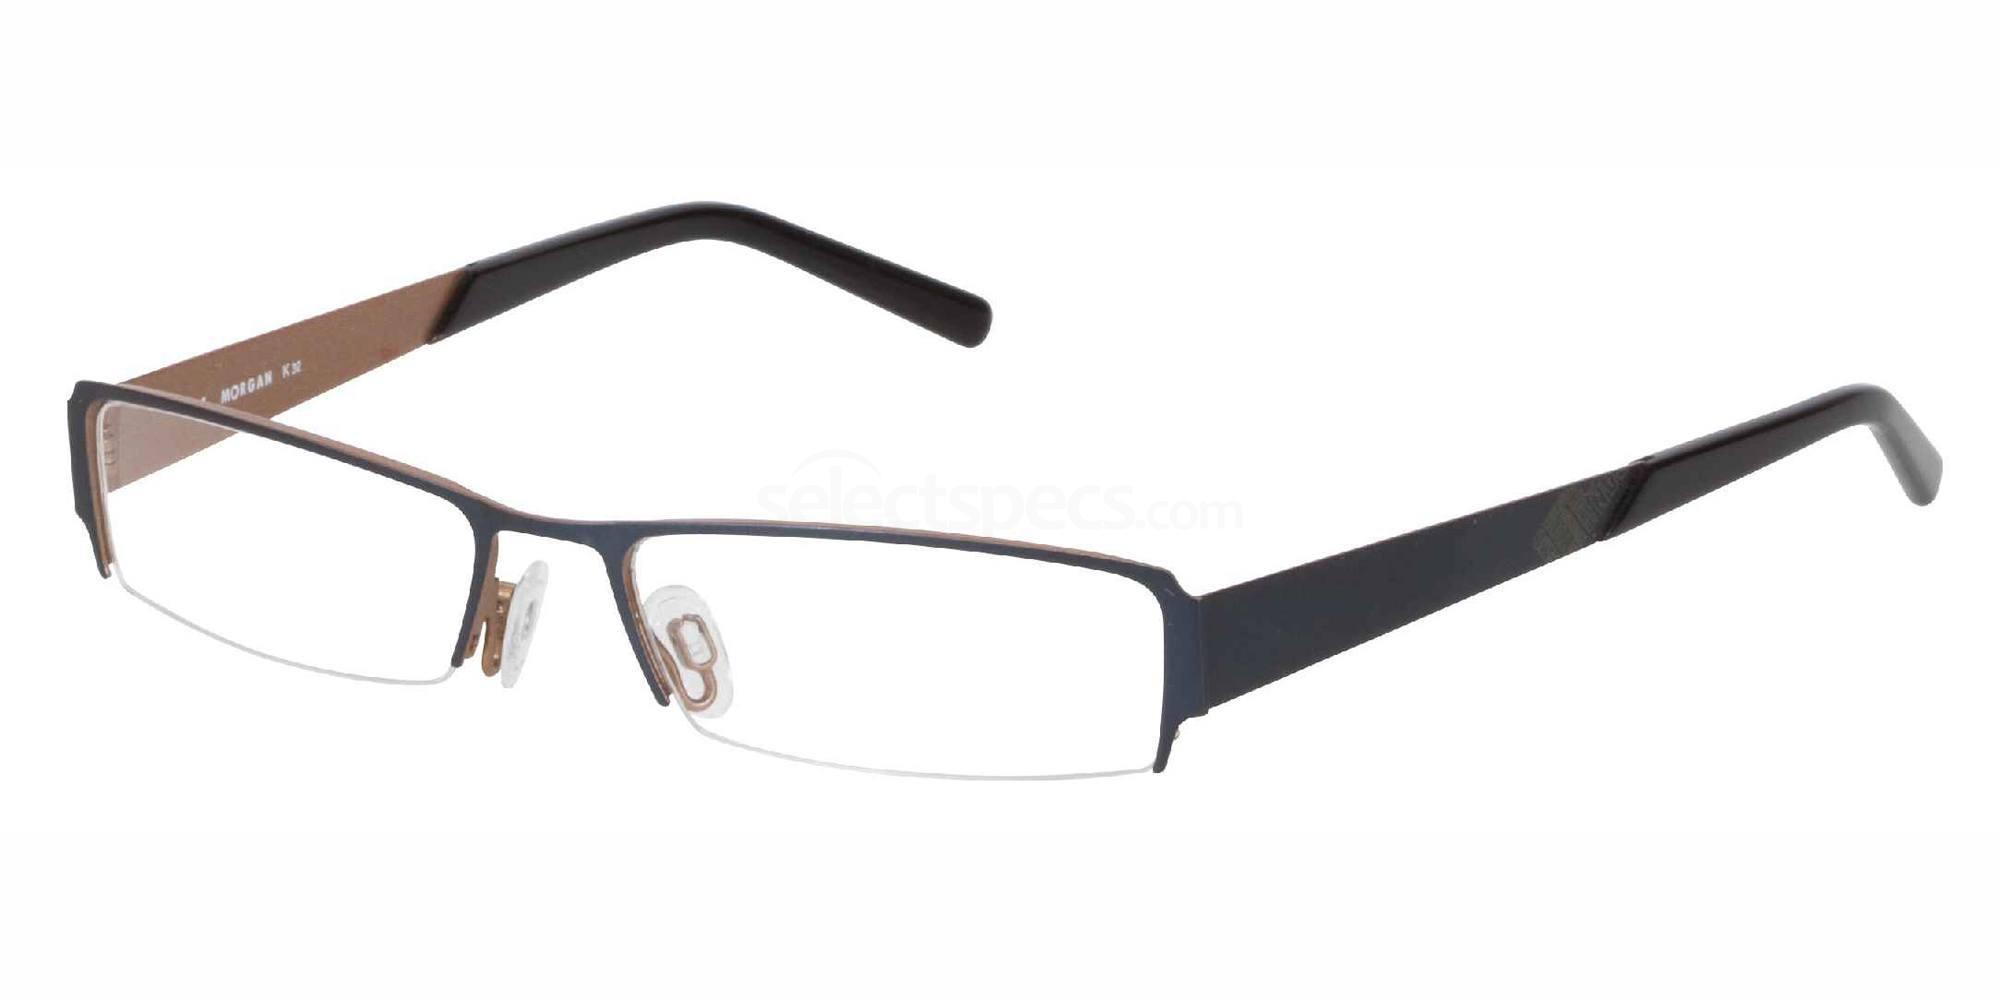 375 203103 Glasses, MORGAN Eyewear